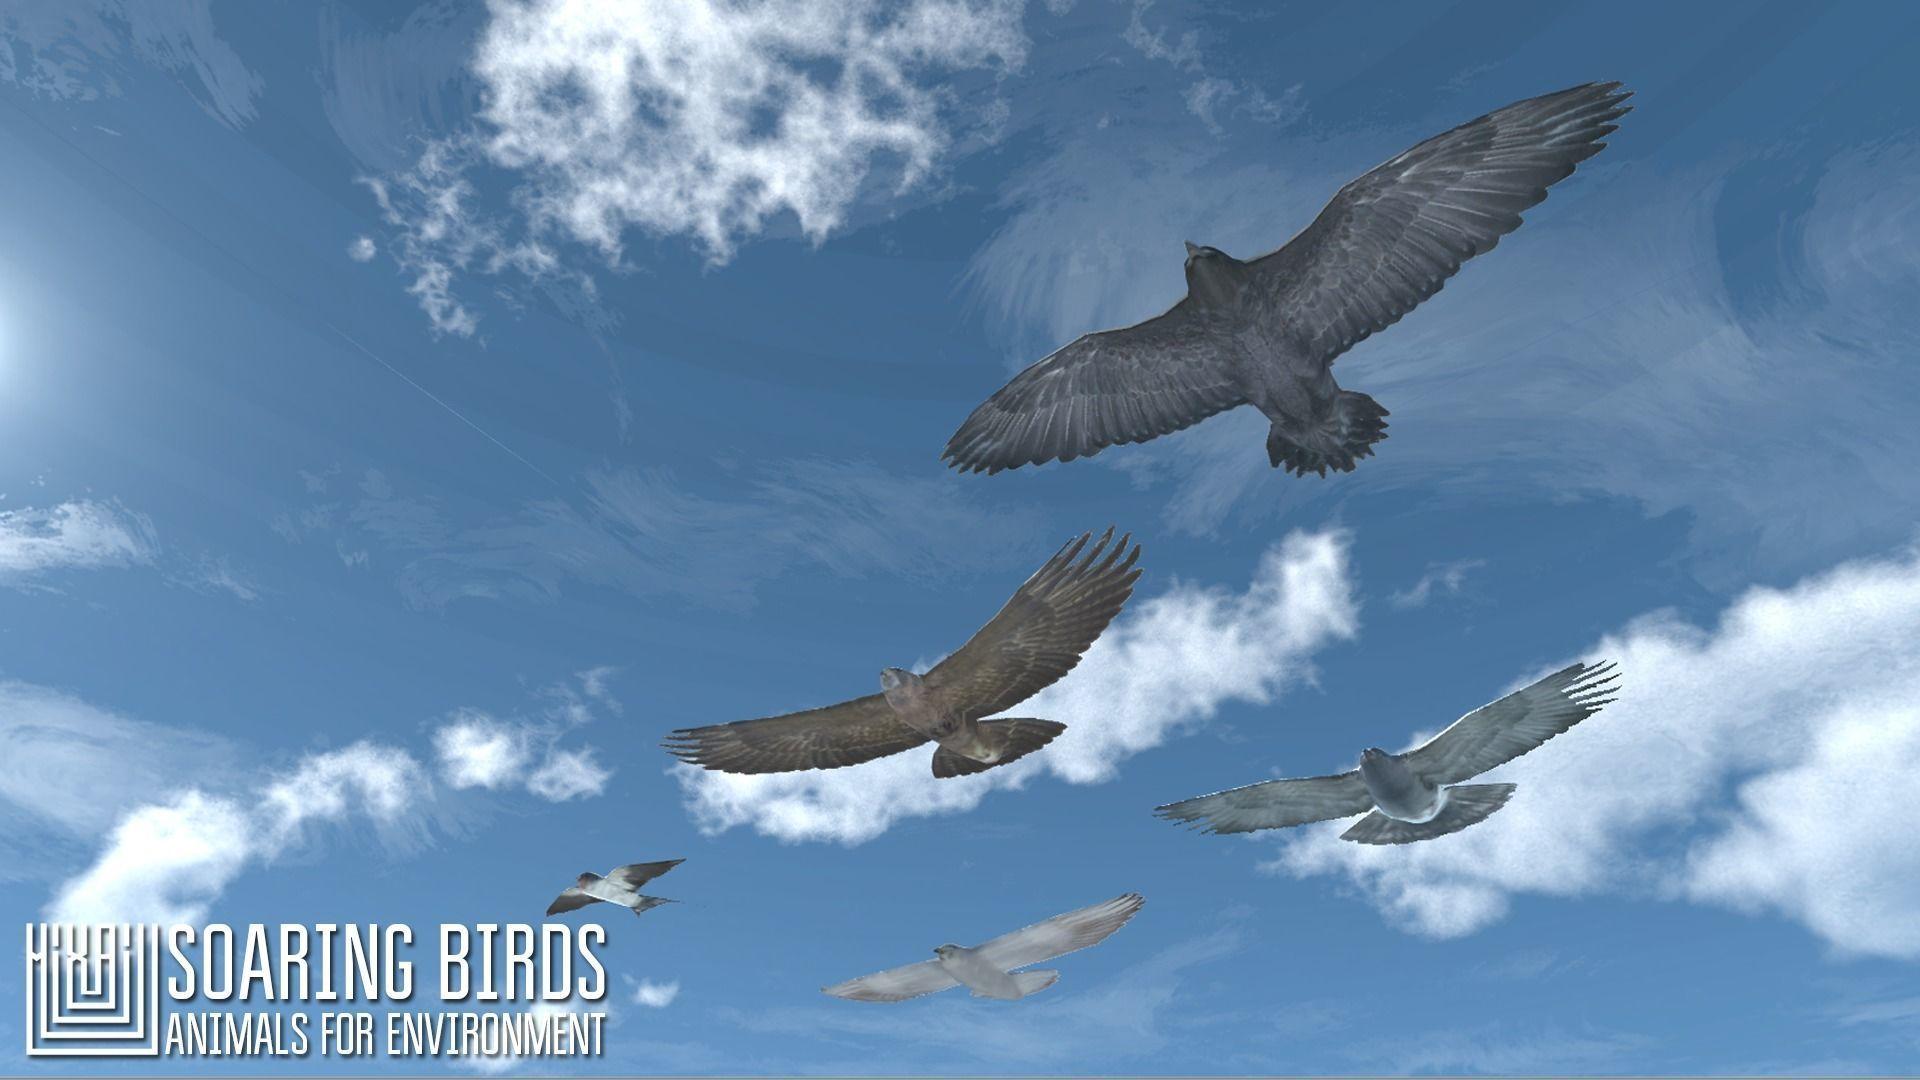 Soaring birds - animals for environment